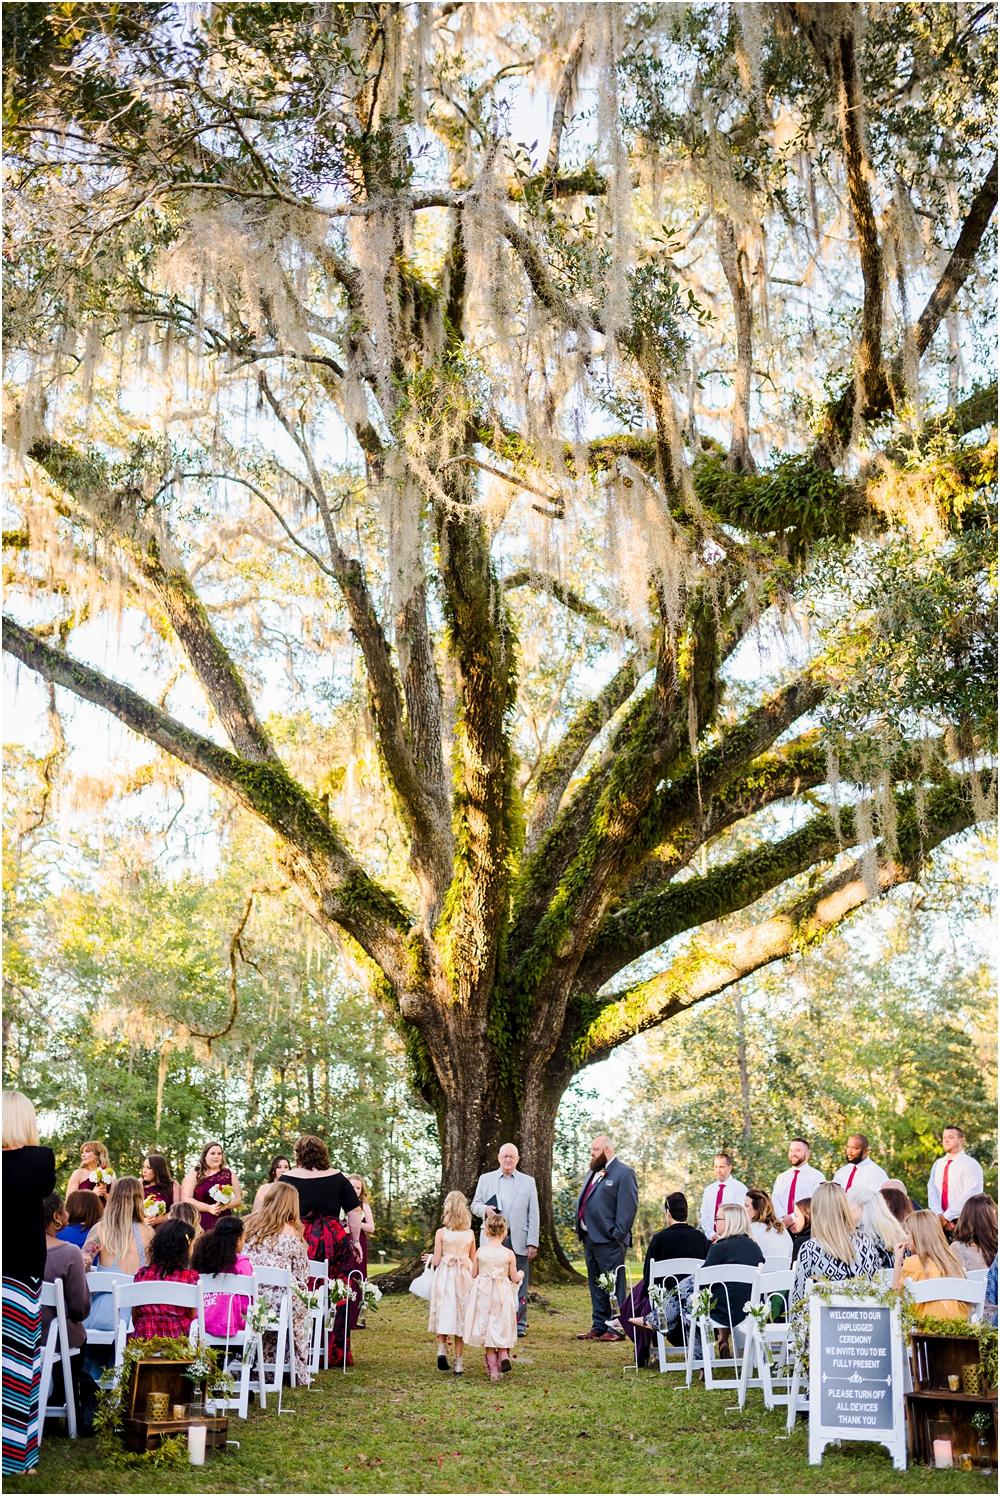 Eden-Gardens-florida-wedding-photographer-kiersten-stevenson-photography-51.jpg